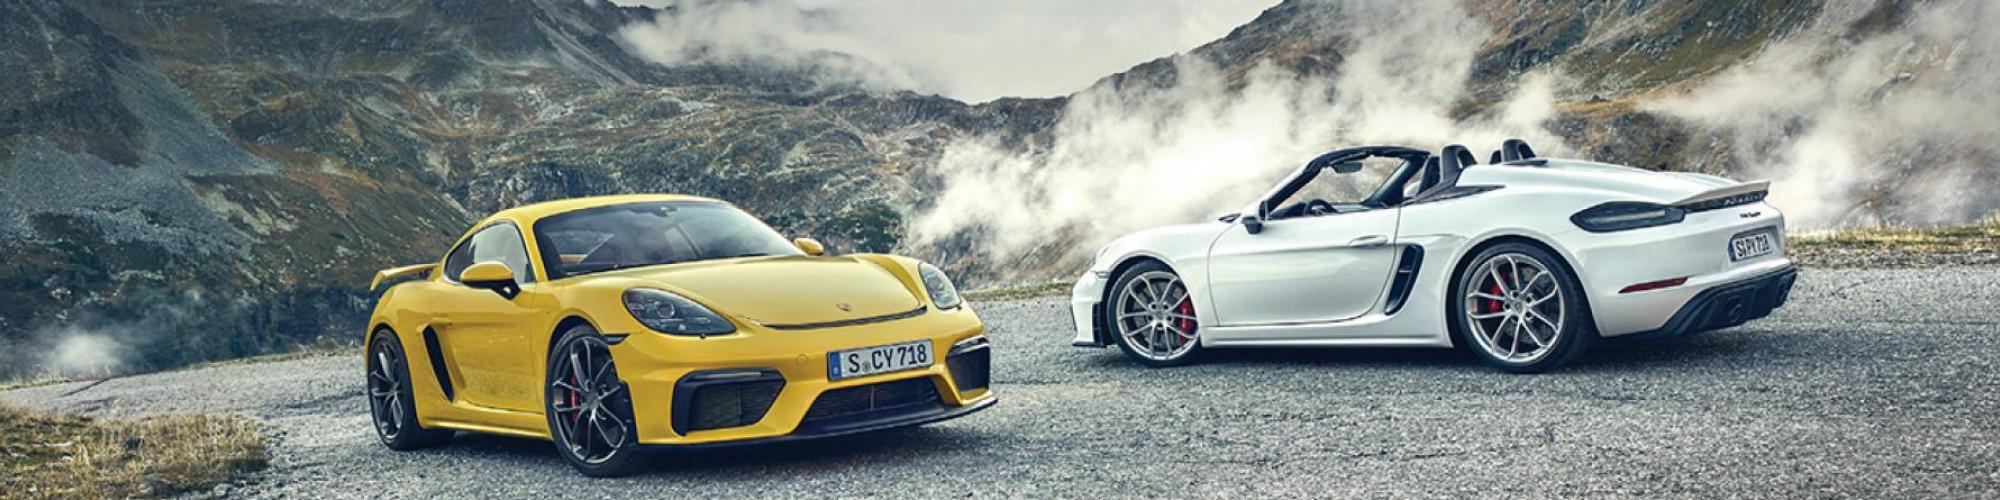 Porsche Club of America cover image